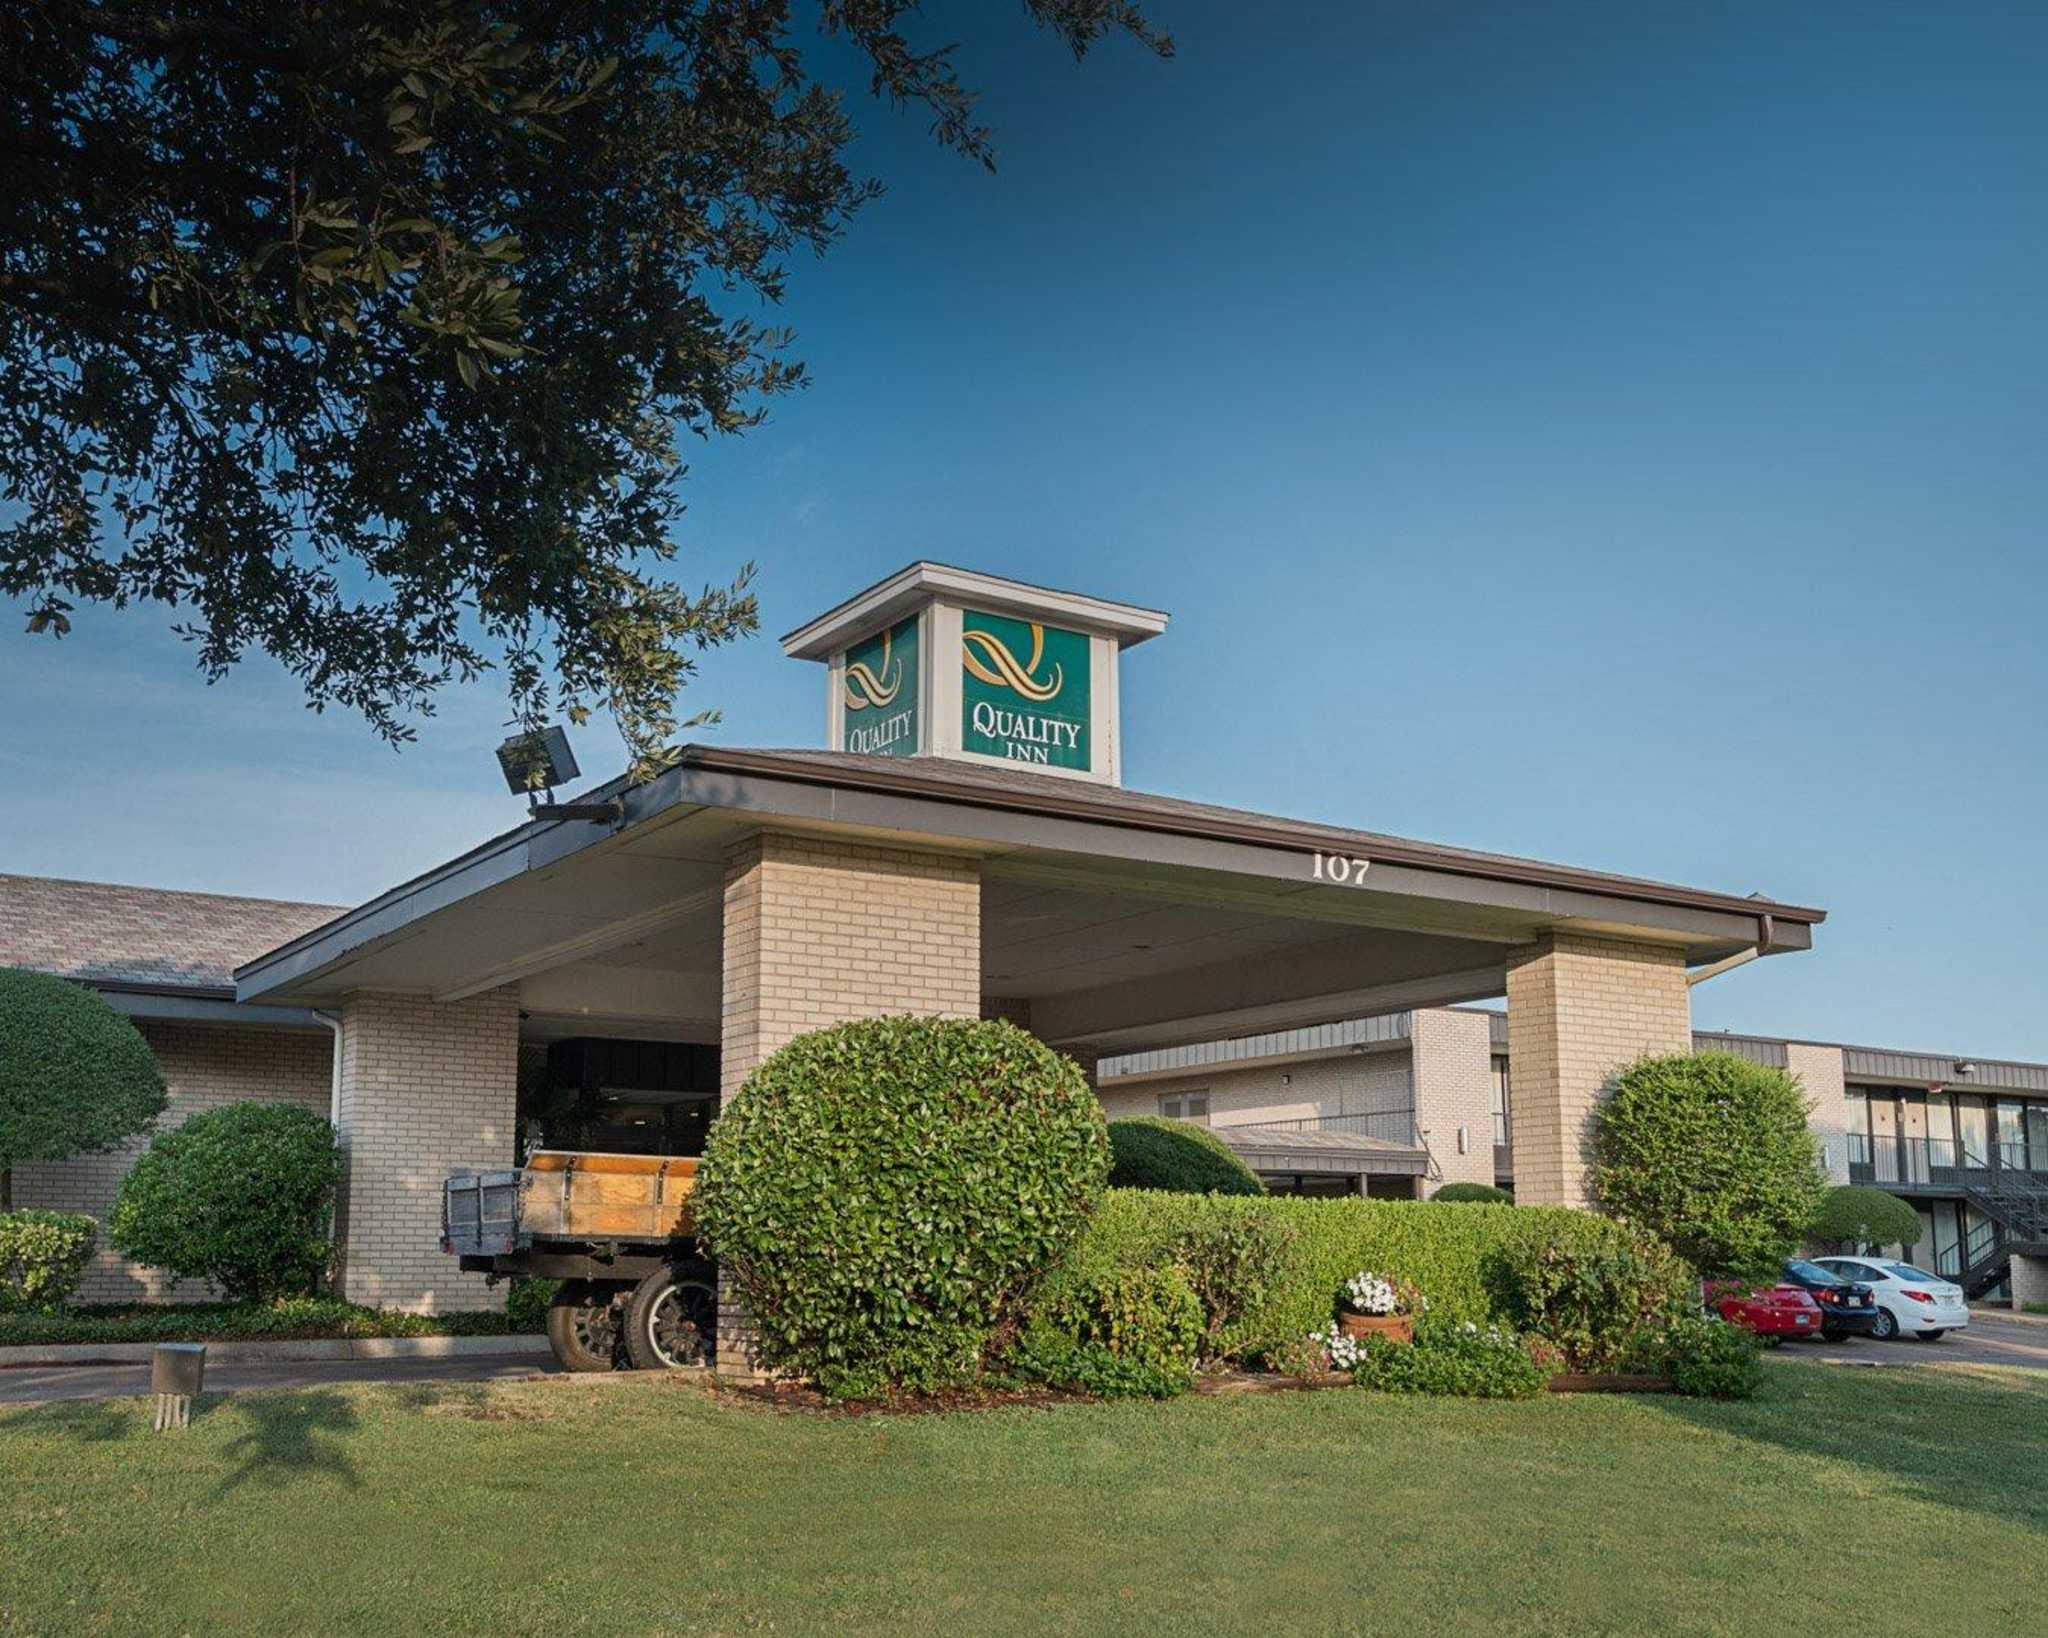 Hotel in TX Ennis 75119 Quality Inn 107 Chamber of Commerce Dr.  (972)875-9641